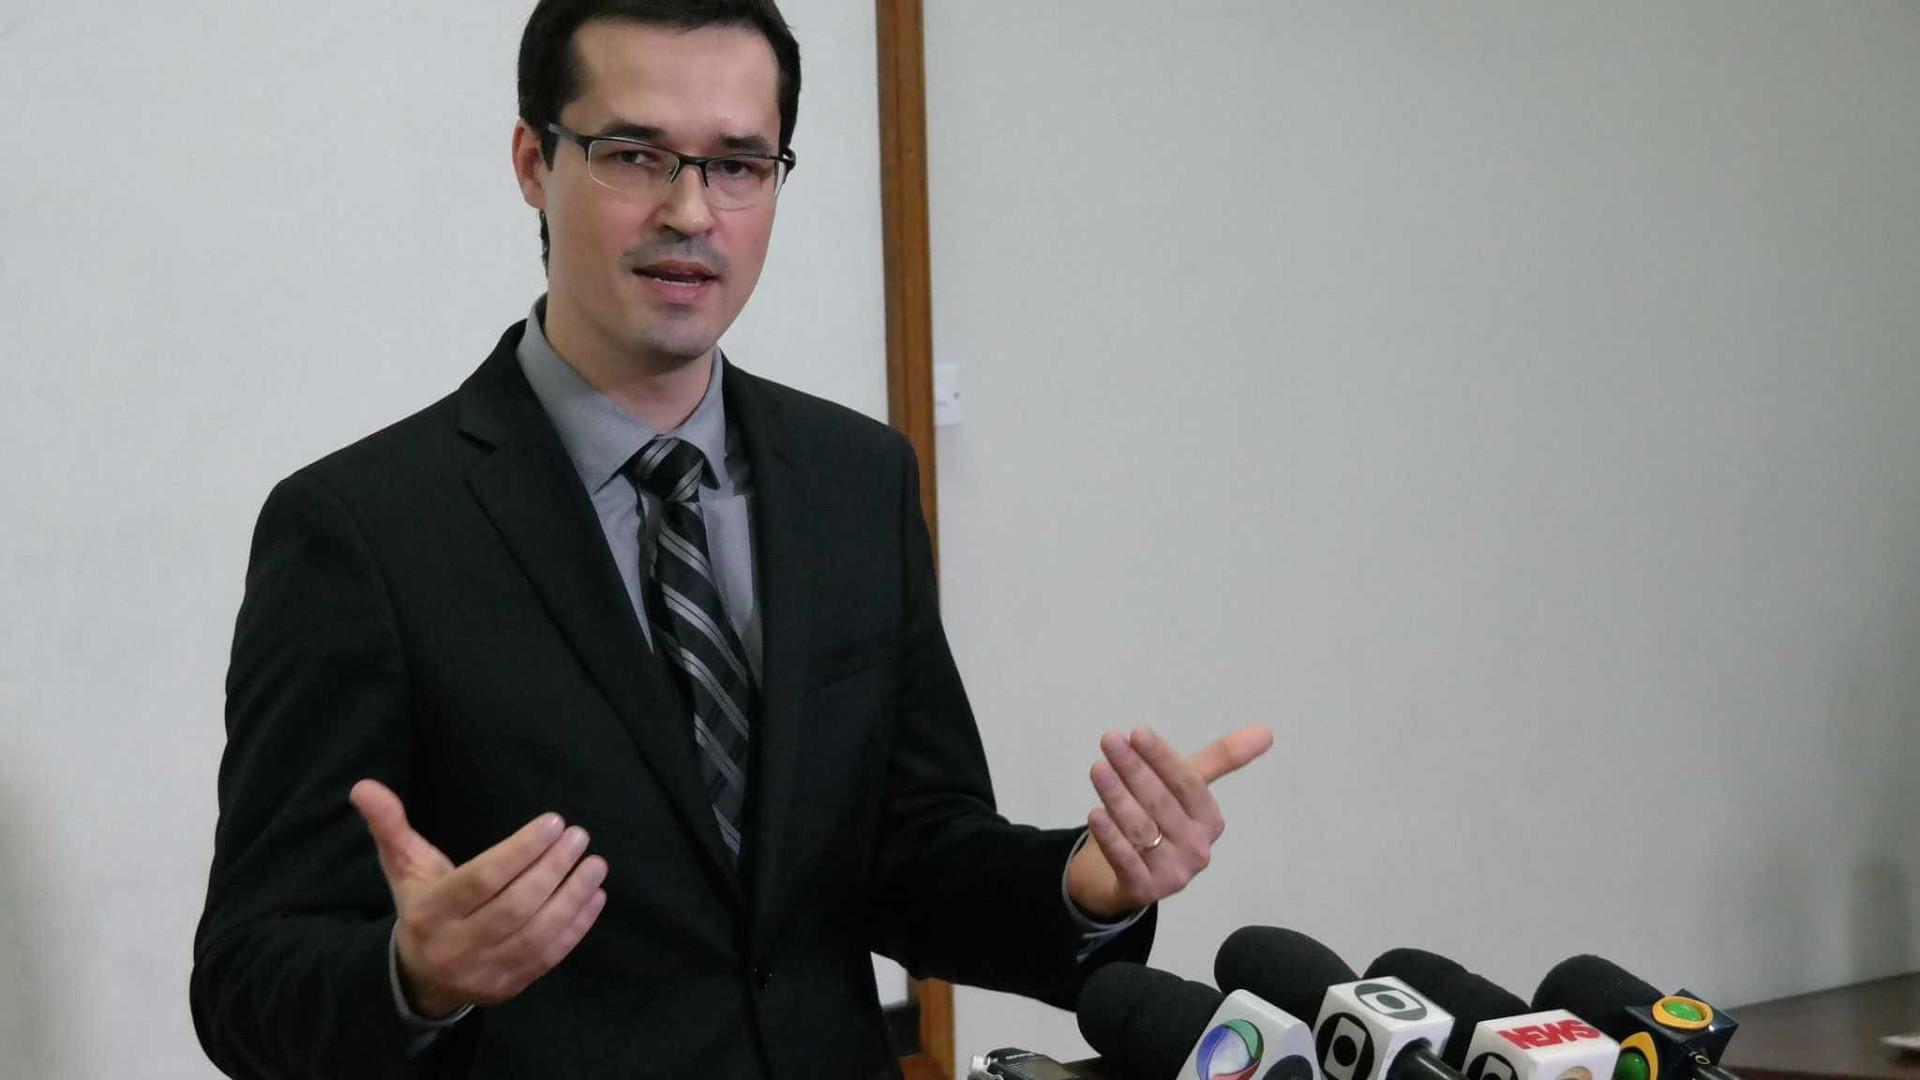 Corregedor do MP abre reclamação disciplinar contra Deltan e Pozzobon